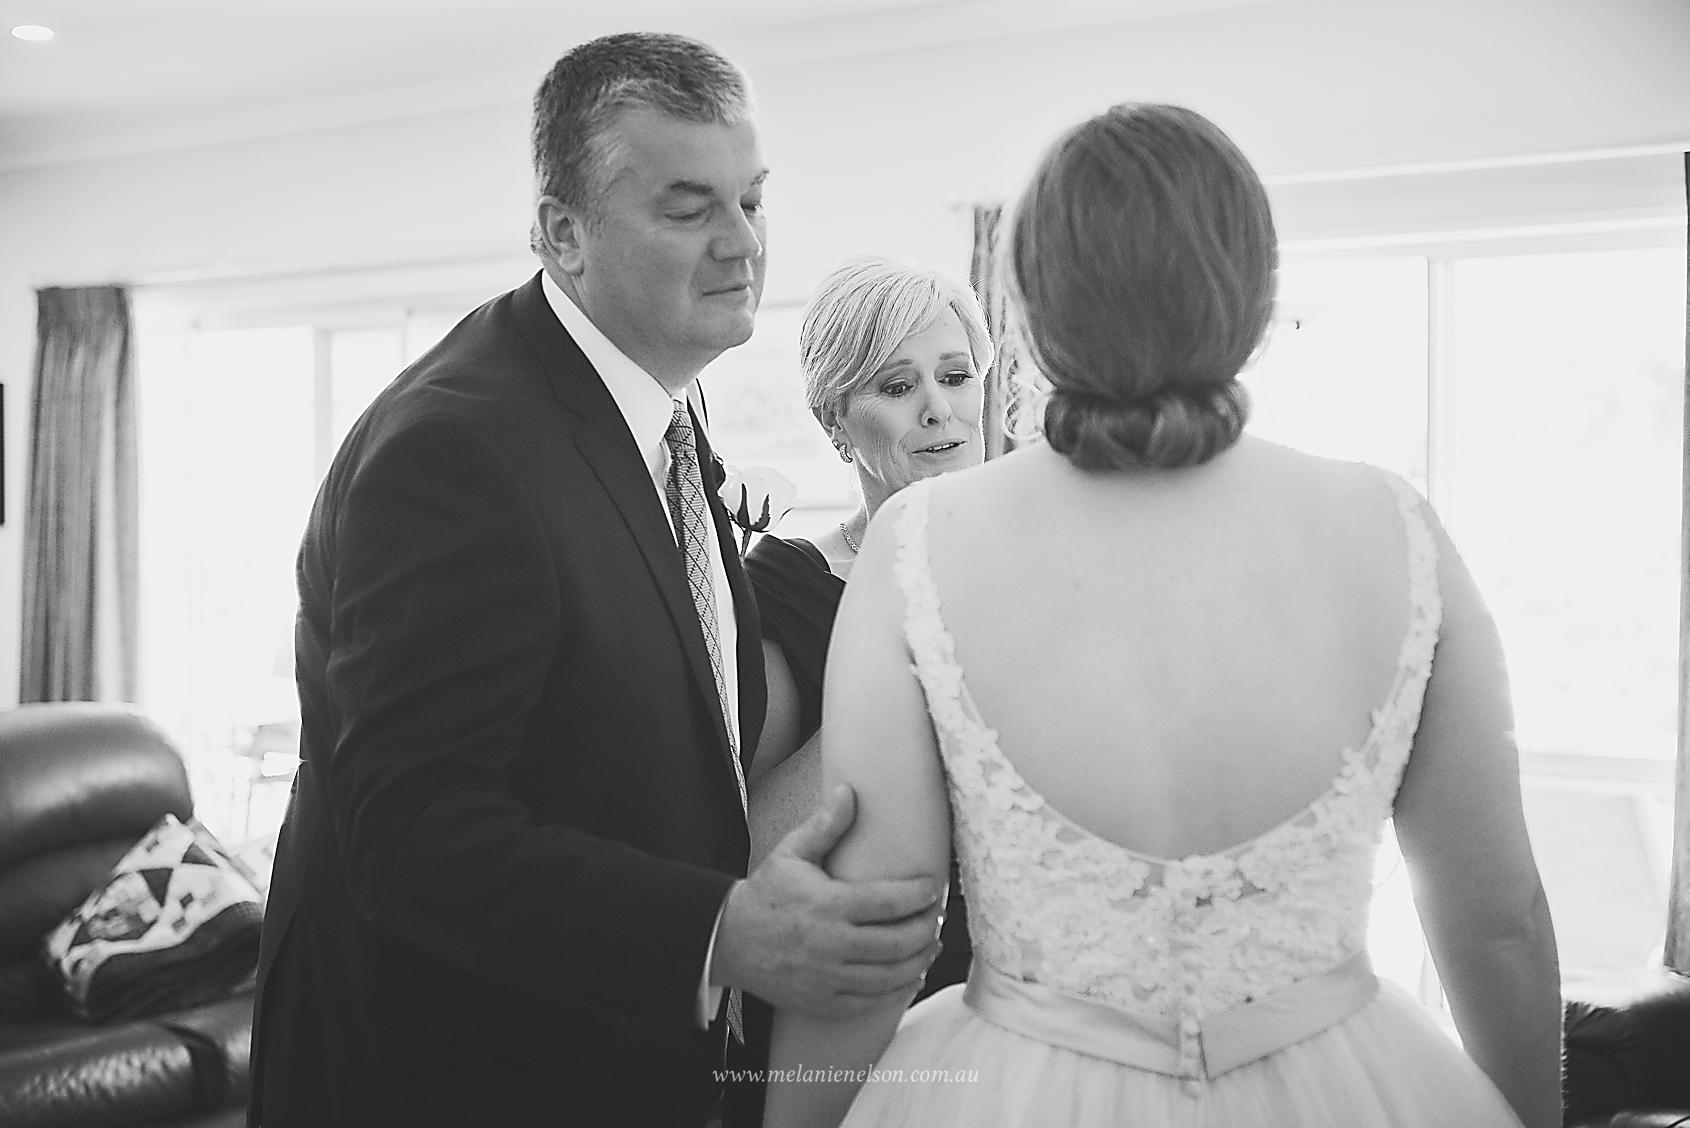 yorke_peninsula_wedding_photographer_0008.jpg